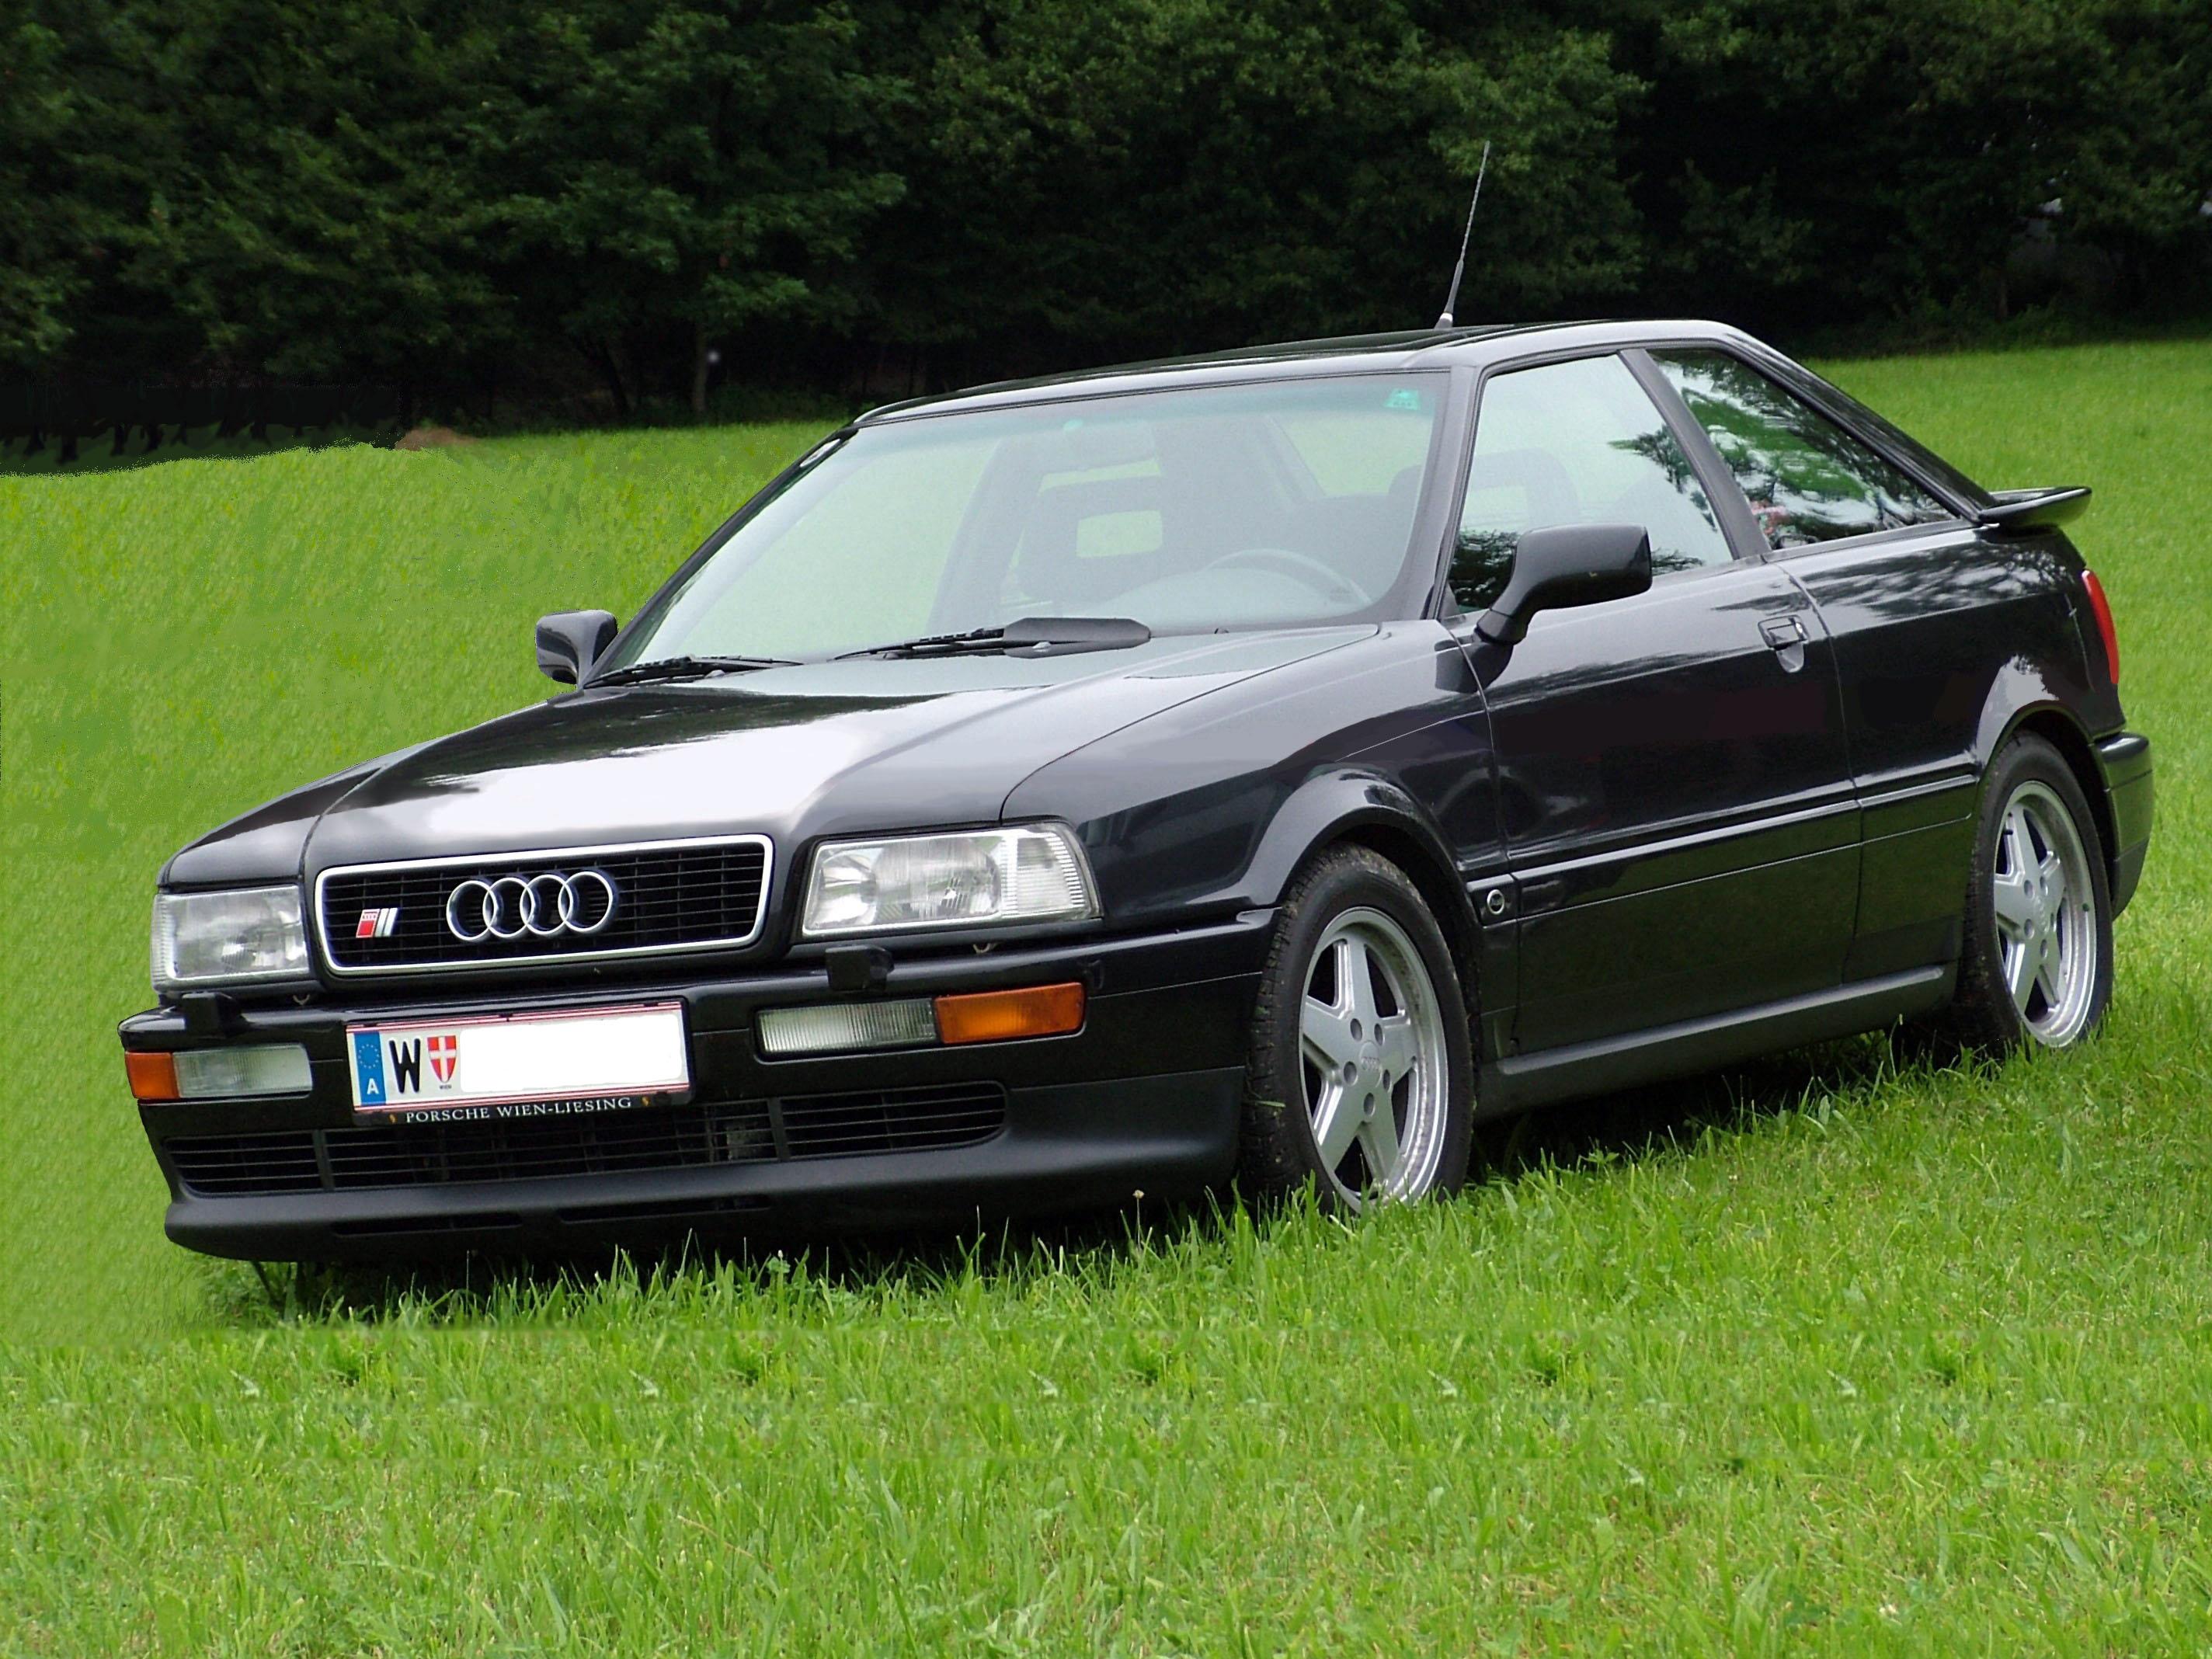 Audi a4 avant 2004 wiki 9